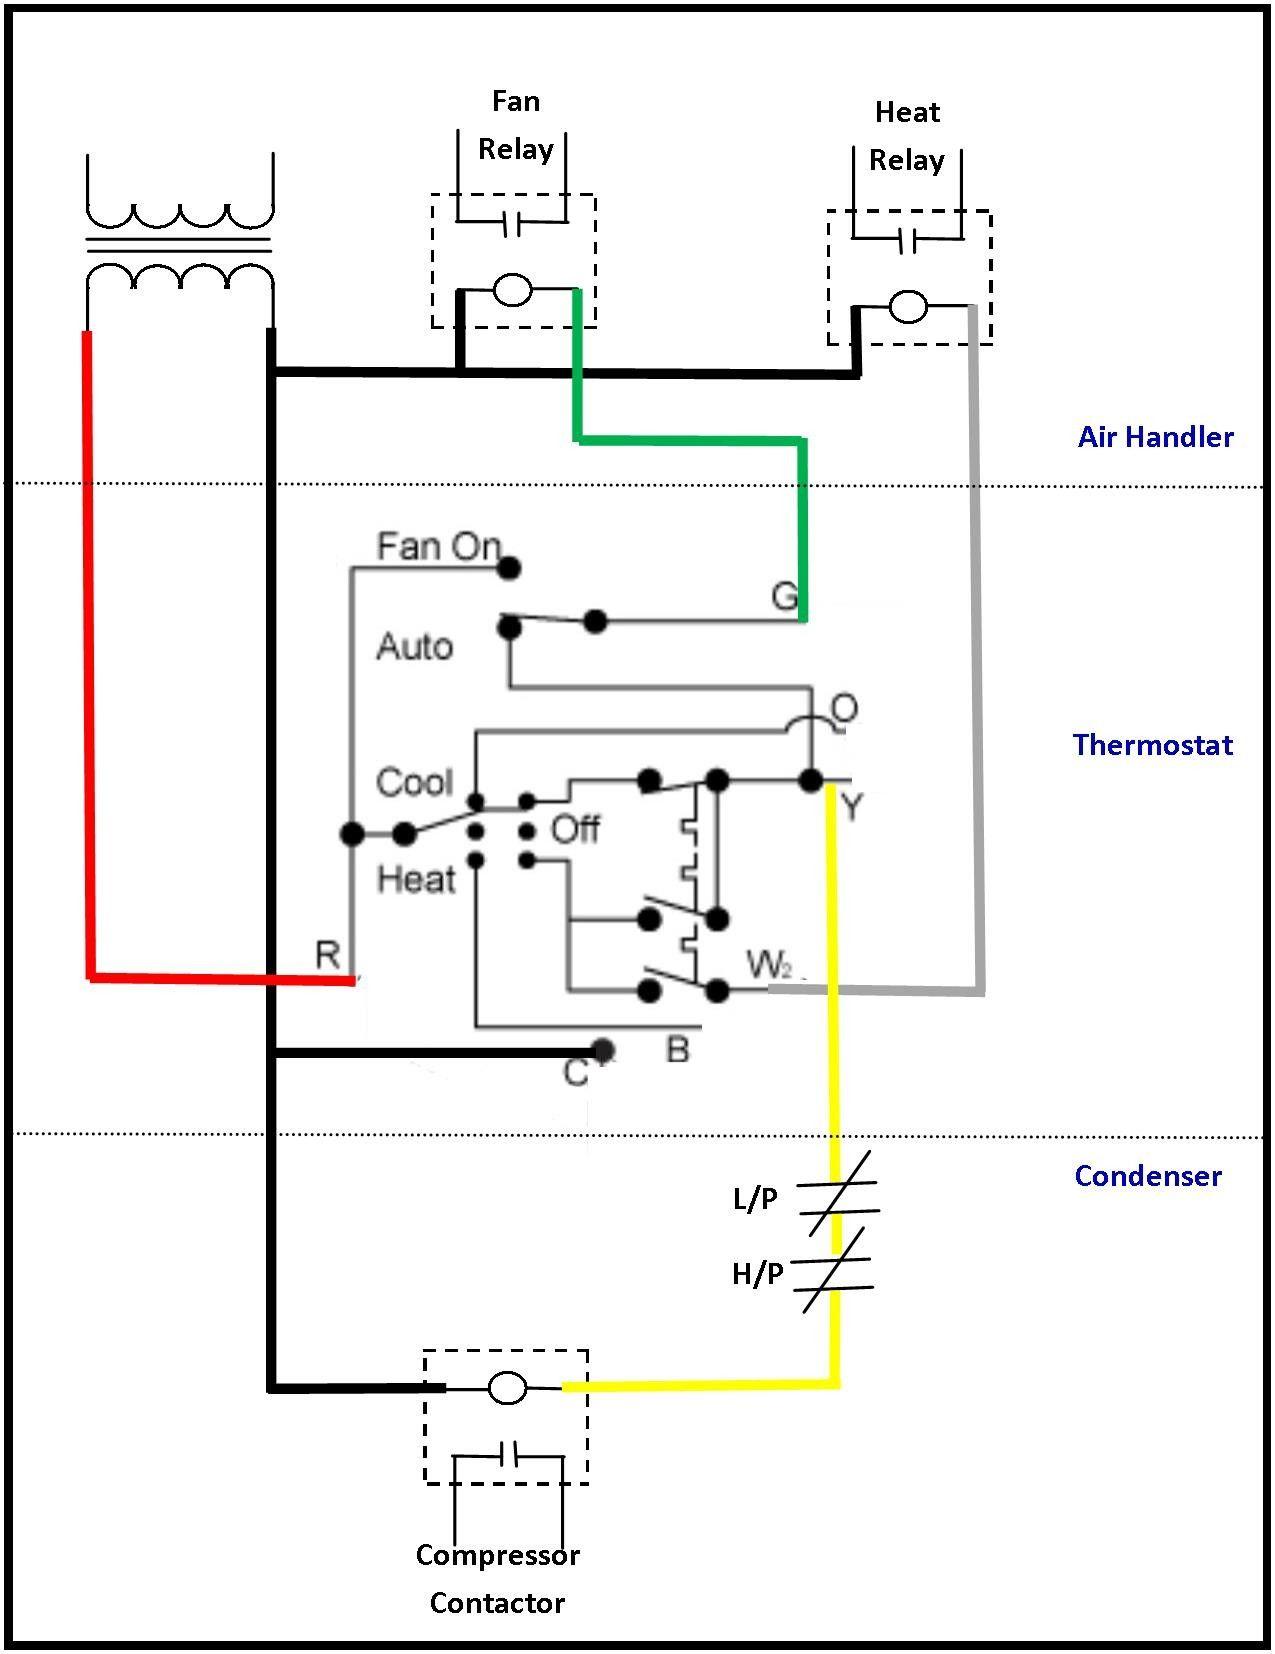 480v To 120v Transformer Wiring Diagram Thermostat Wiring Ac Wiring Electrical Circuit Diagram